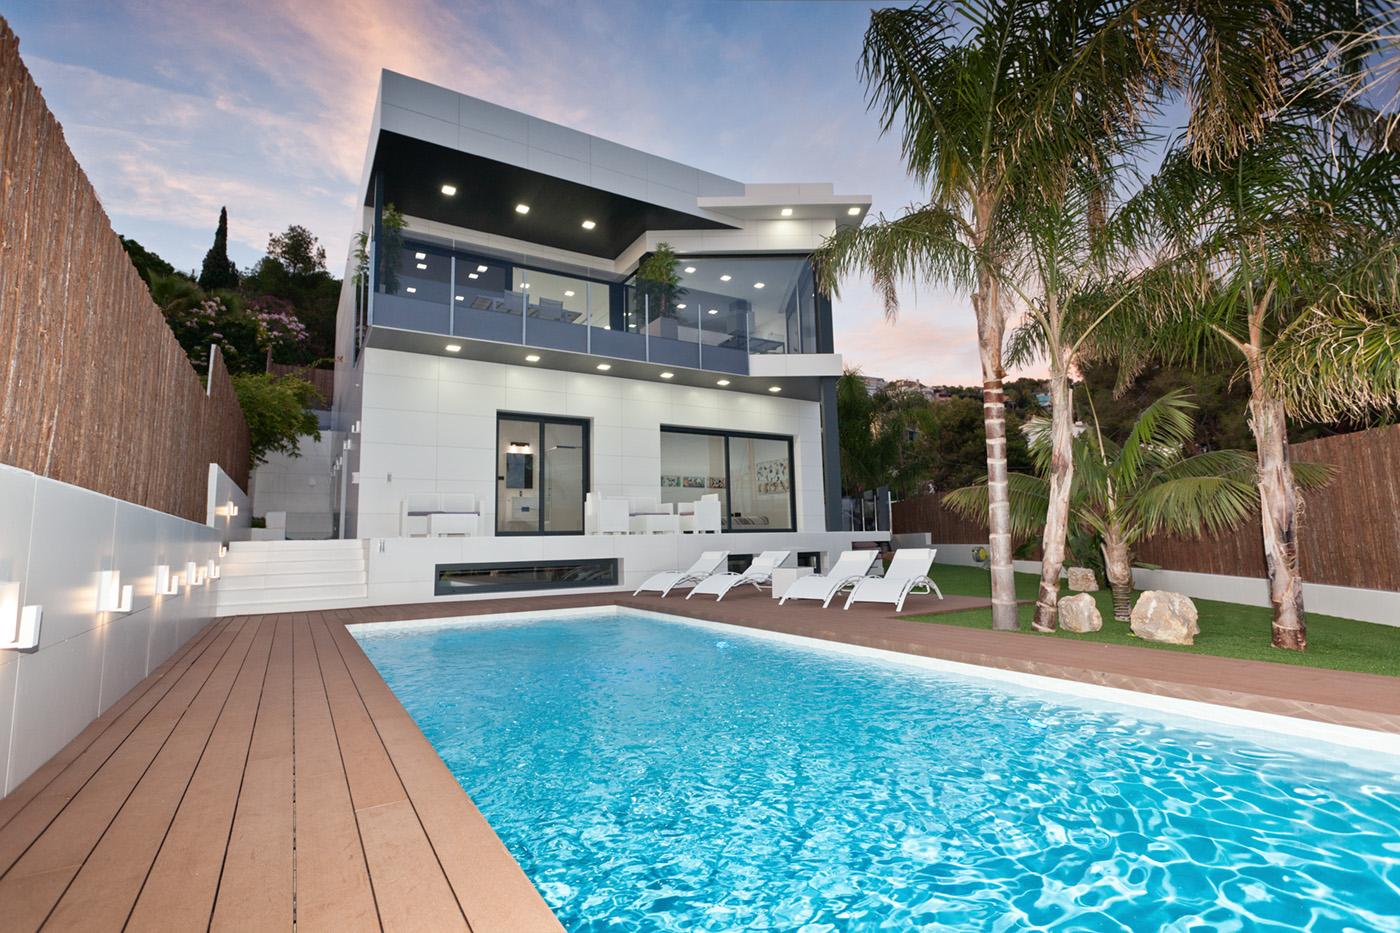 Single Family House Corral d'en Falç Sitges Barcelona